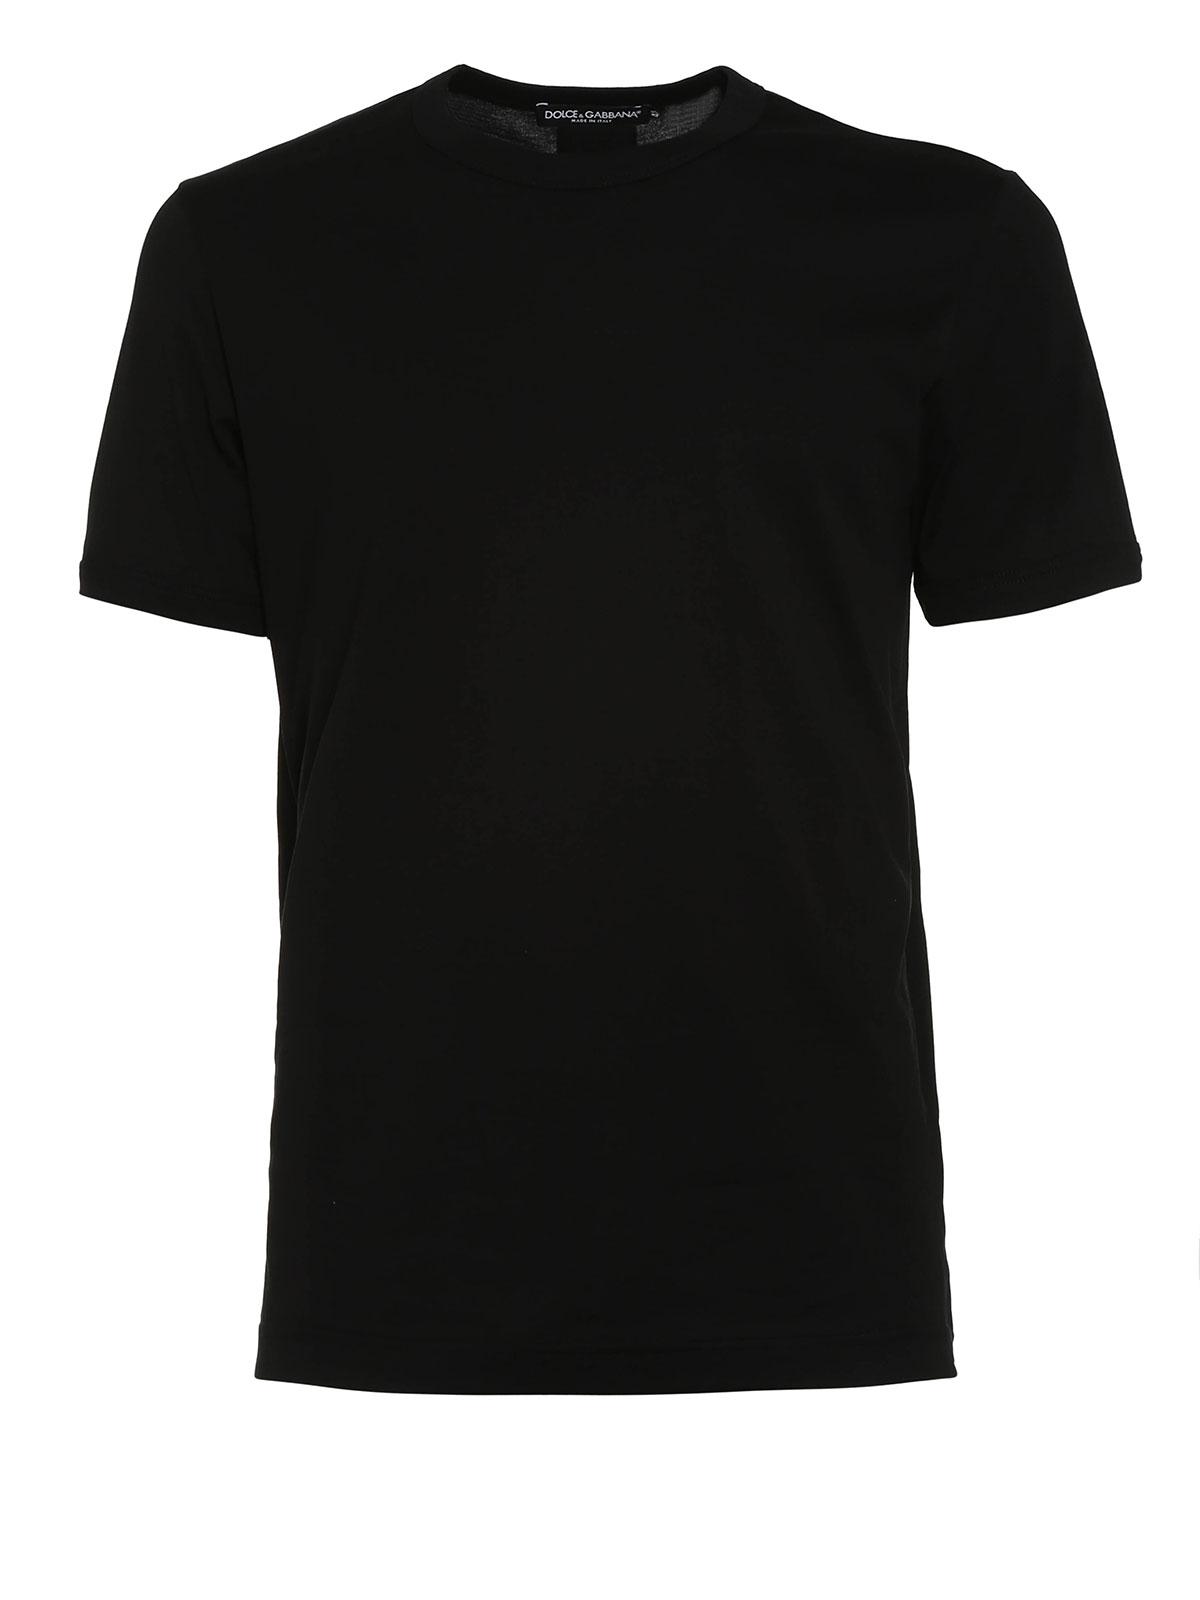 cotton t shirt by dolce gabbana t shirts shop online at. Black Bedroom Furniture Sets. Home Design Ideas